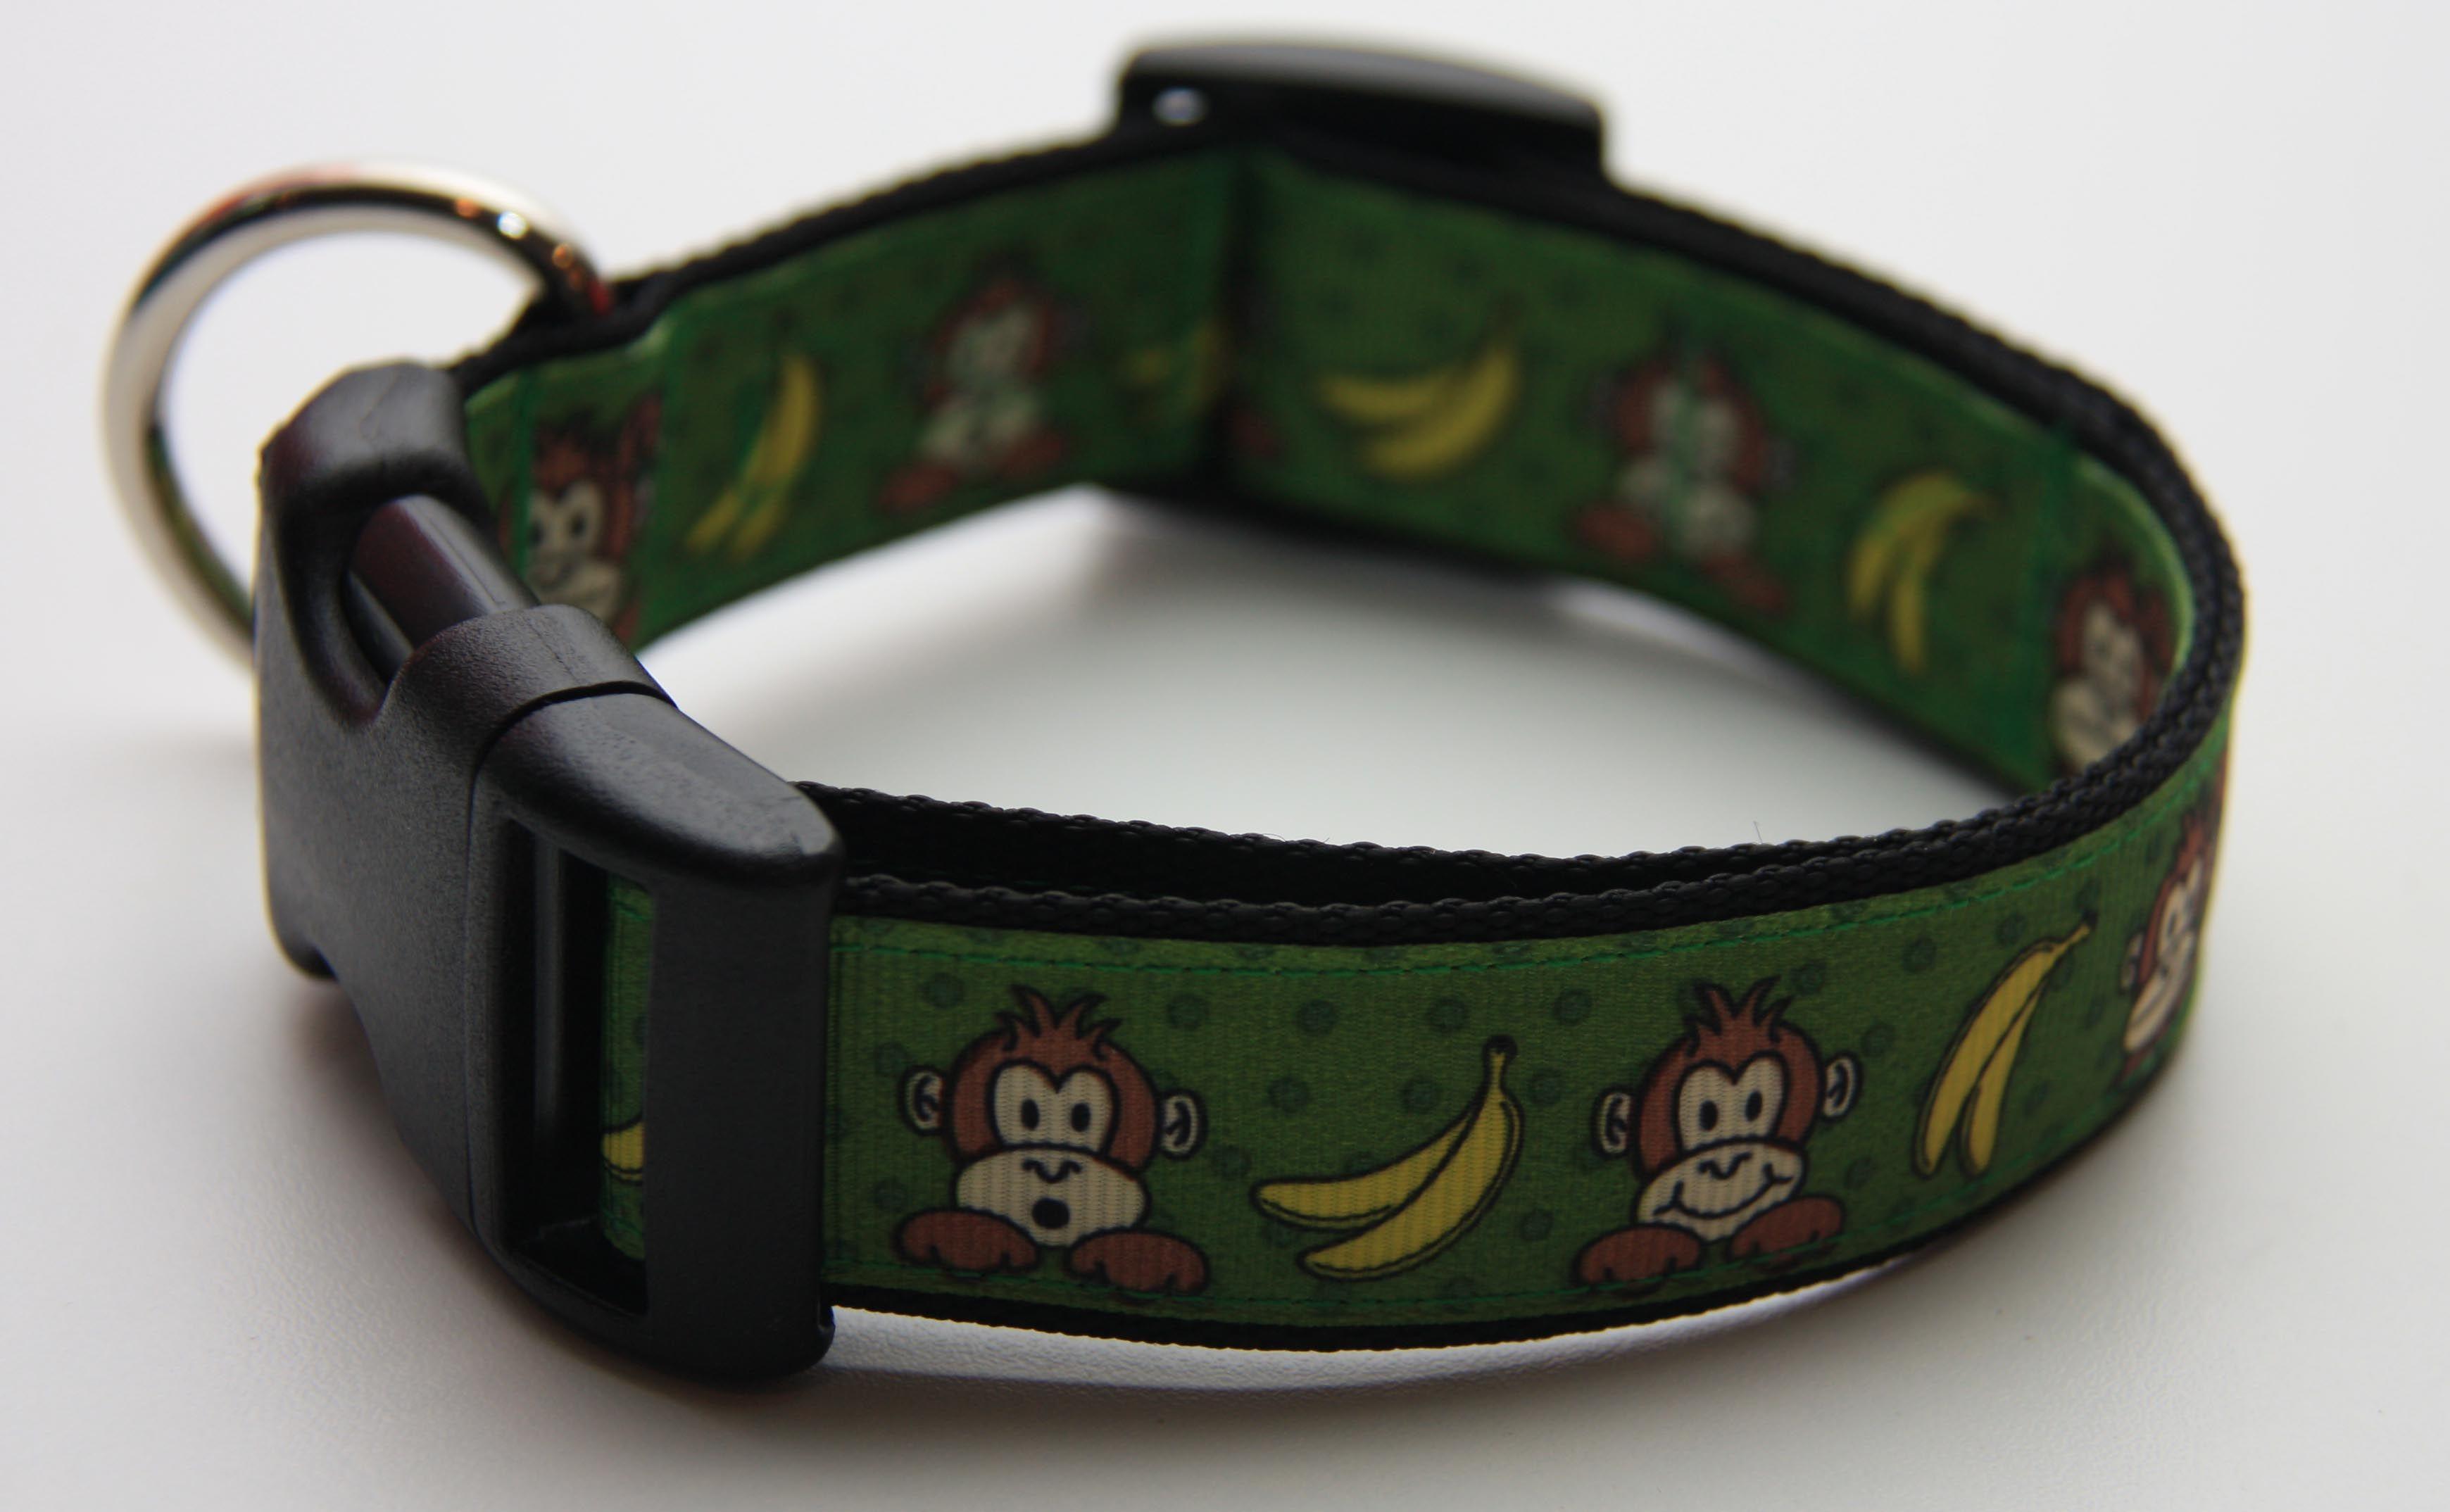 Green monkey 1 dog collar 1500 find bonzai gifts on